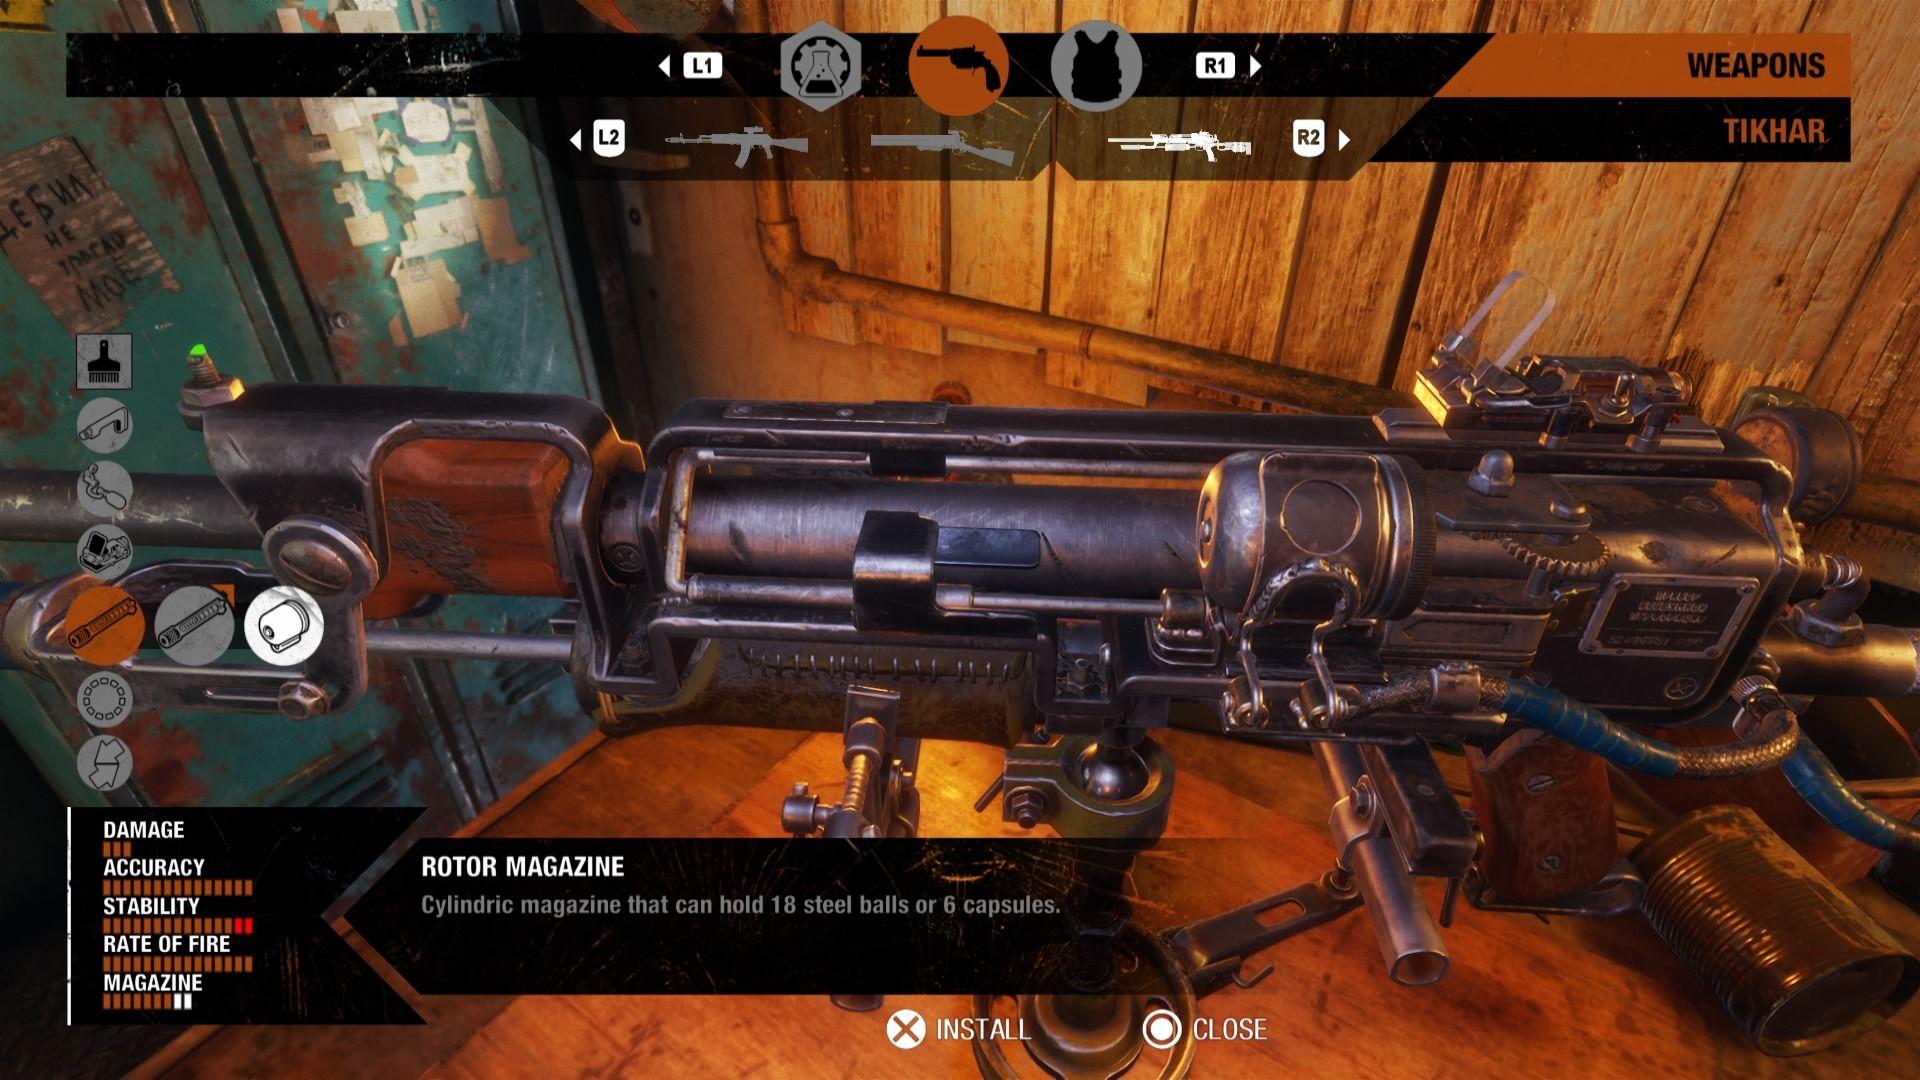 metro-exodus-weapons-list-tikhar-customization